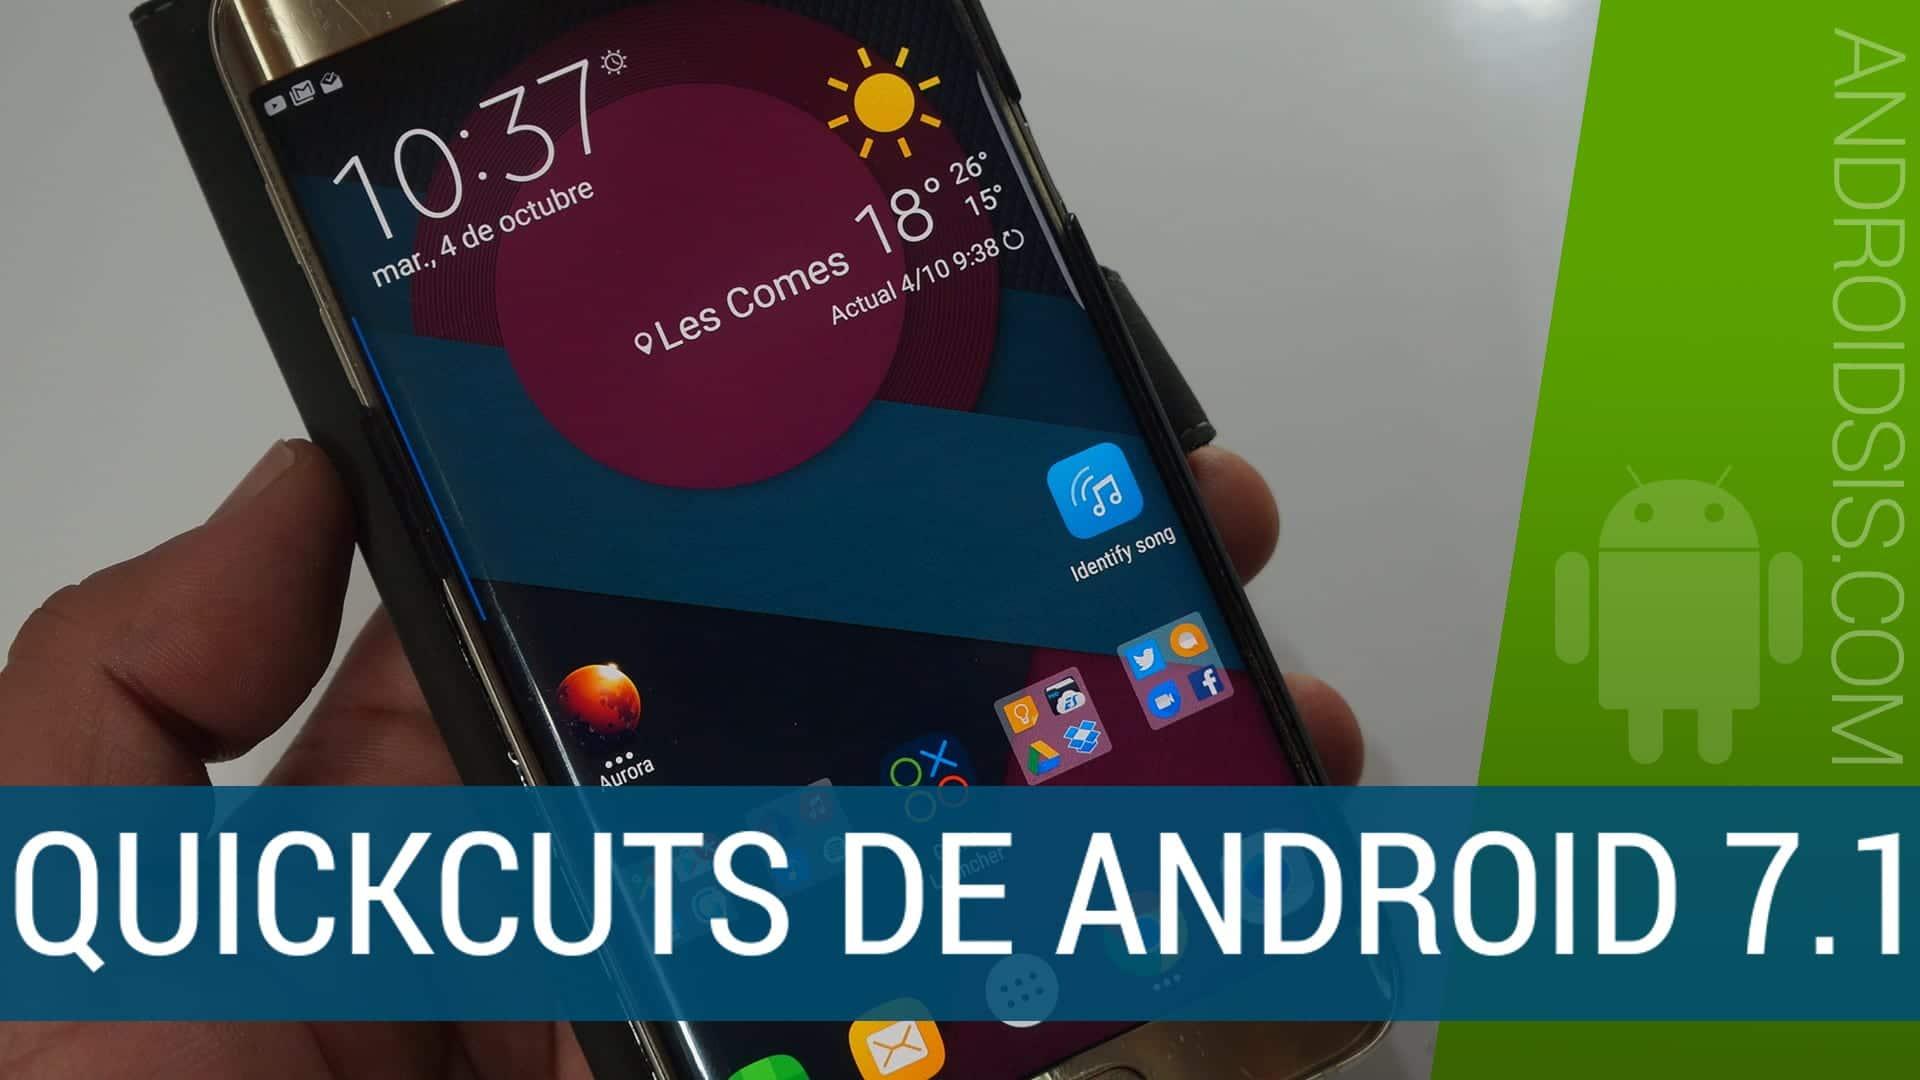 Quickcuts de Android N